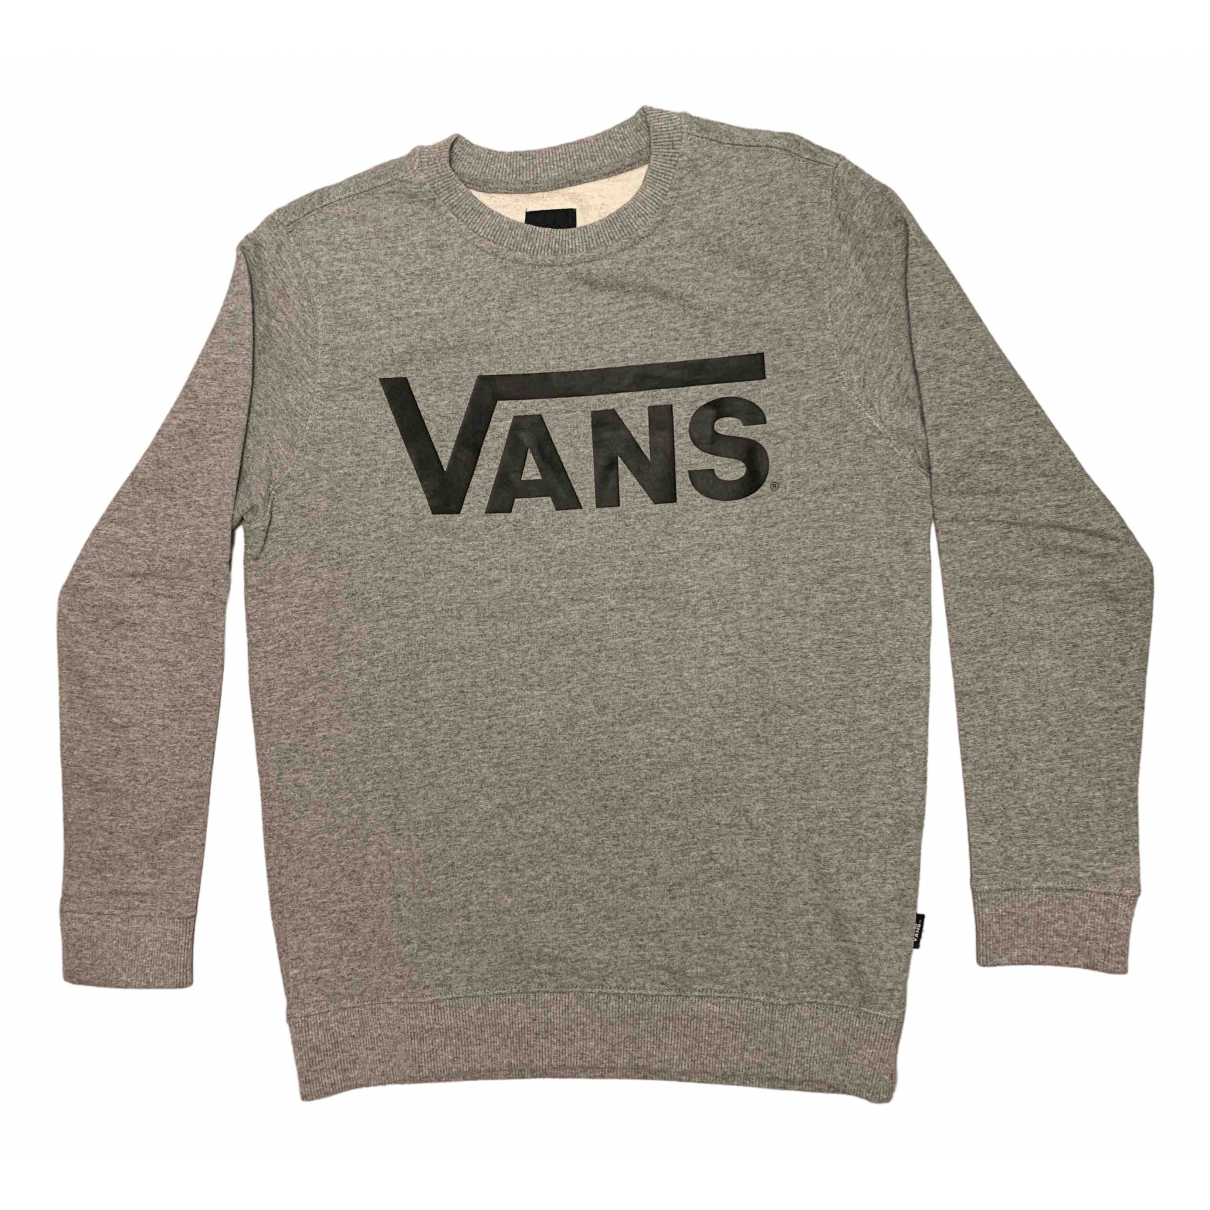 Vans N Grey Cotton Knitwear for Kids 12 years - XS FR